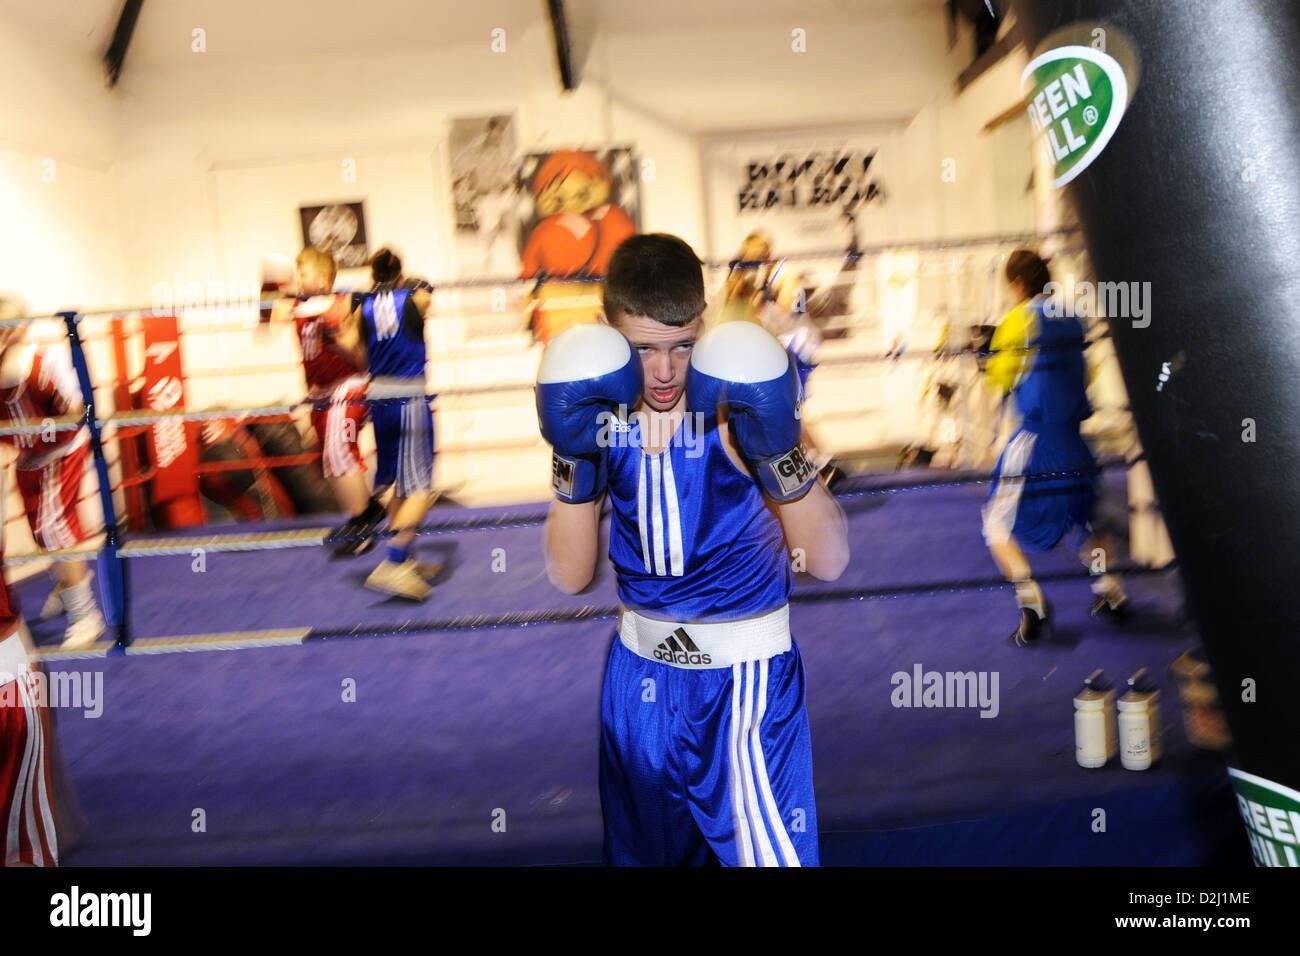 Boxing Club South Yorkshire UK Photo Stock